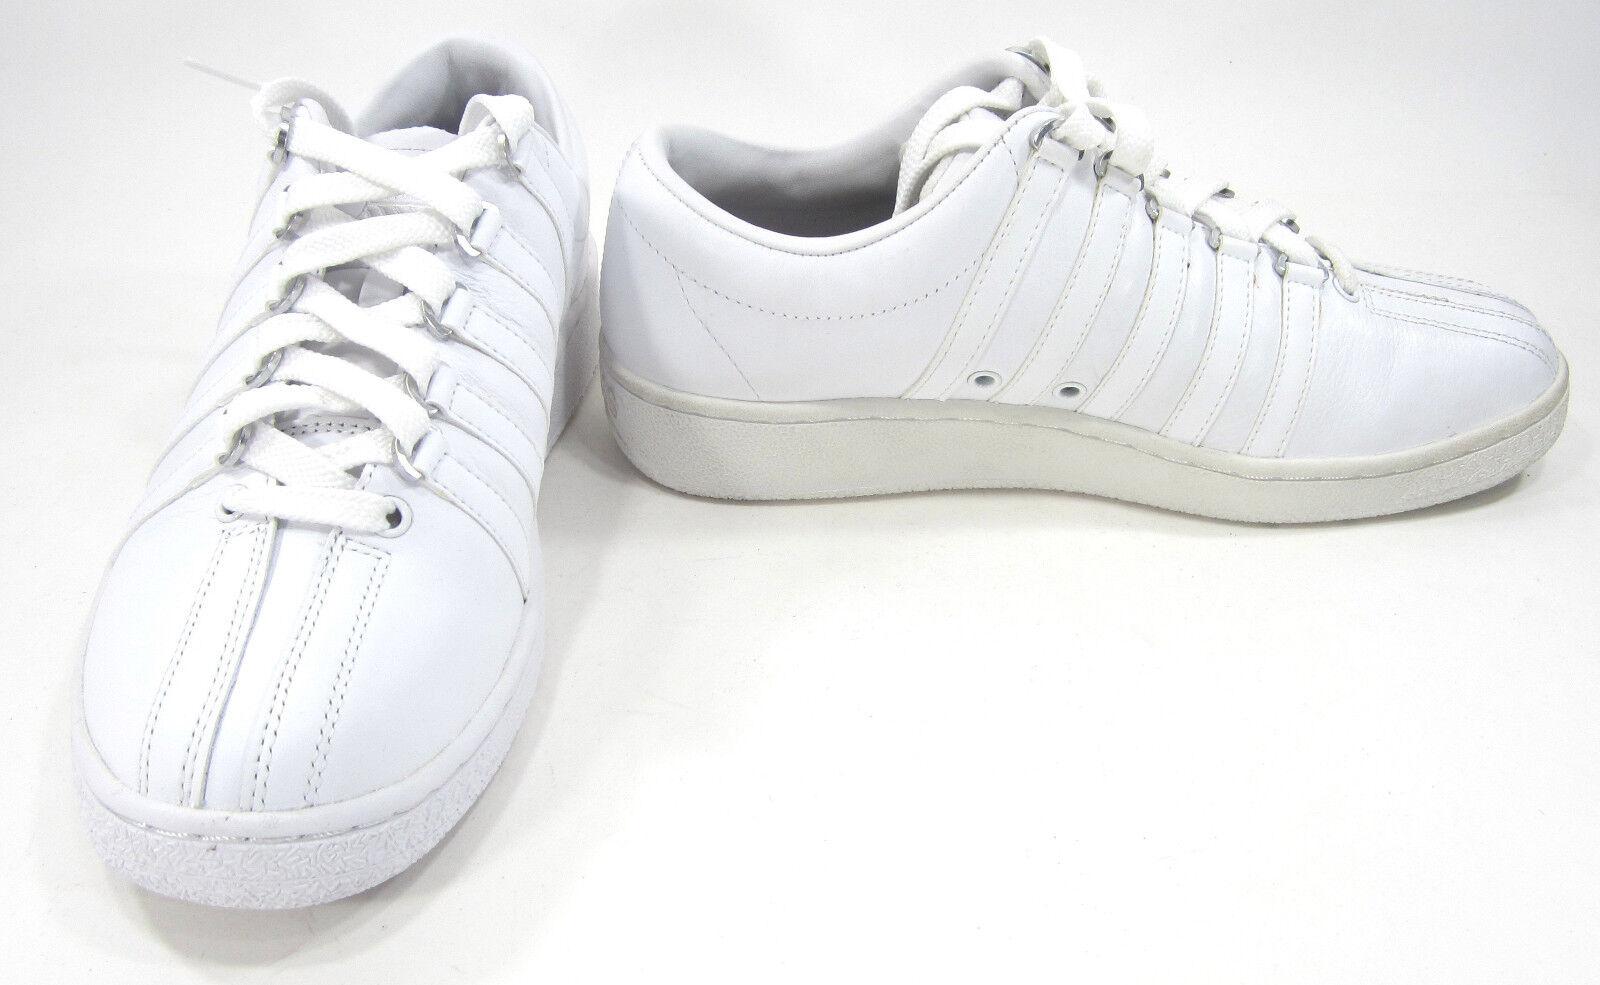 K-swiss scarpe classiche scarpe bianche bianche scarpe 8 edizione di lusso 61fced